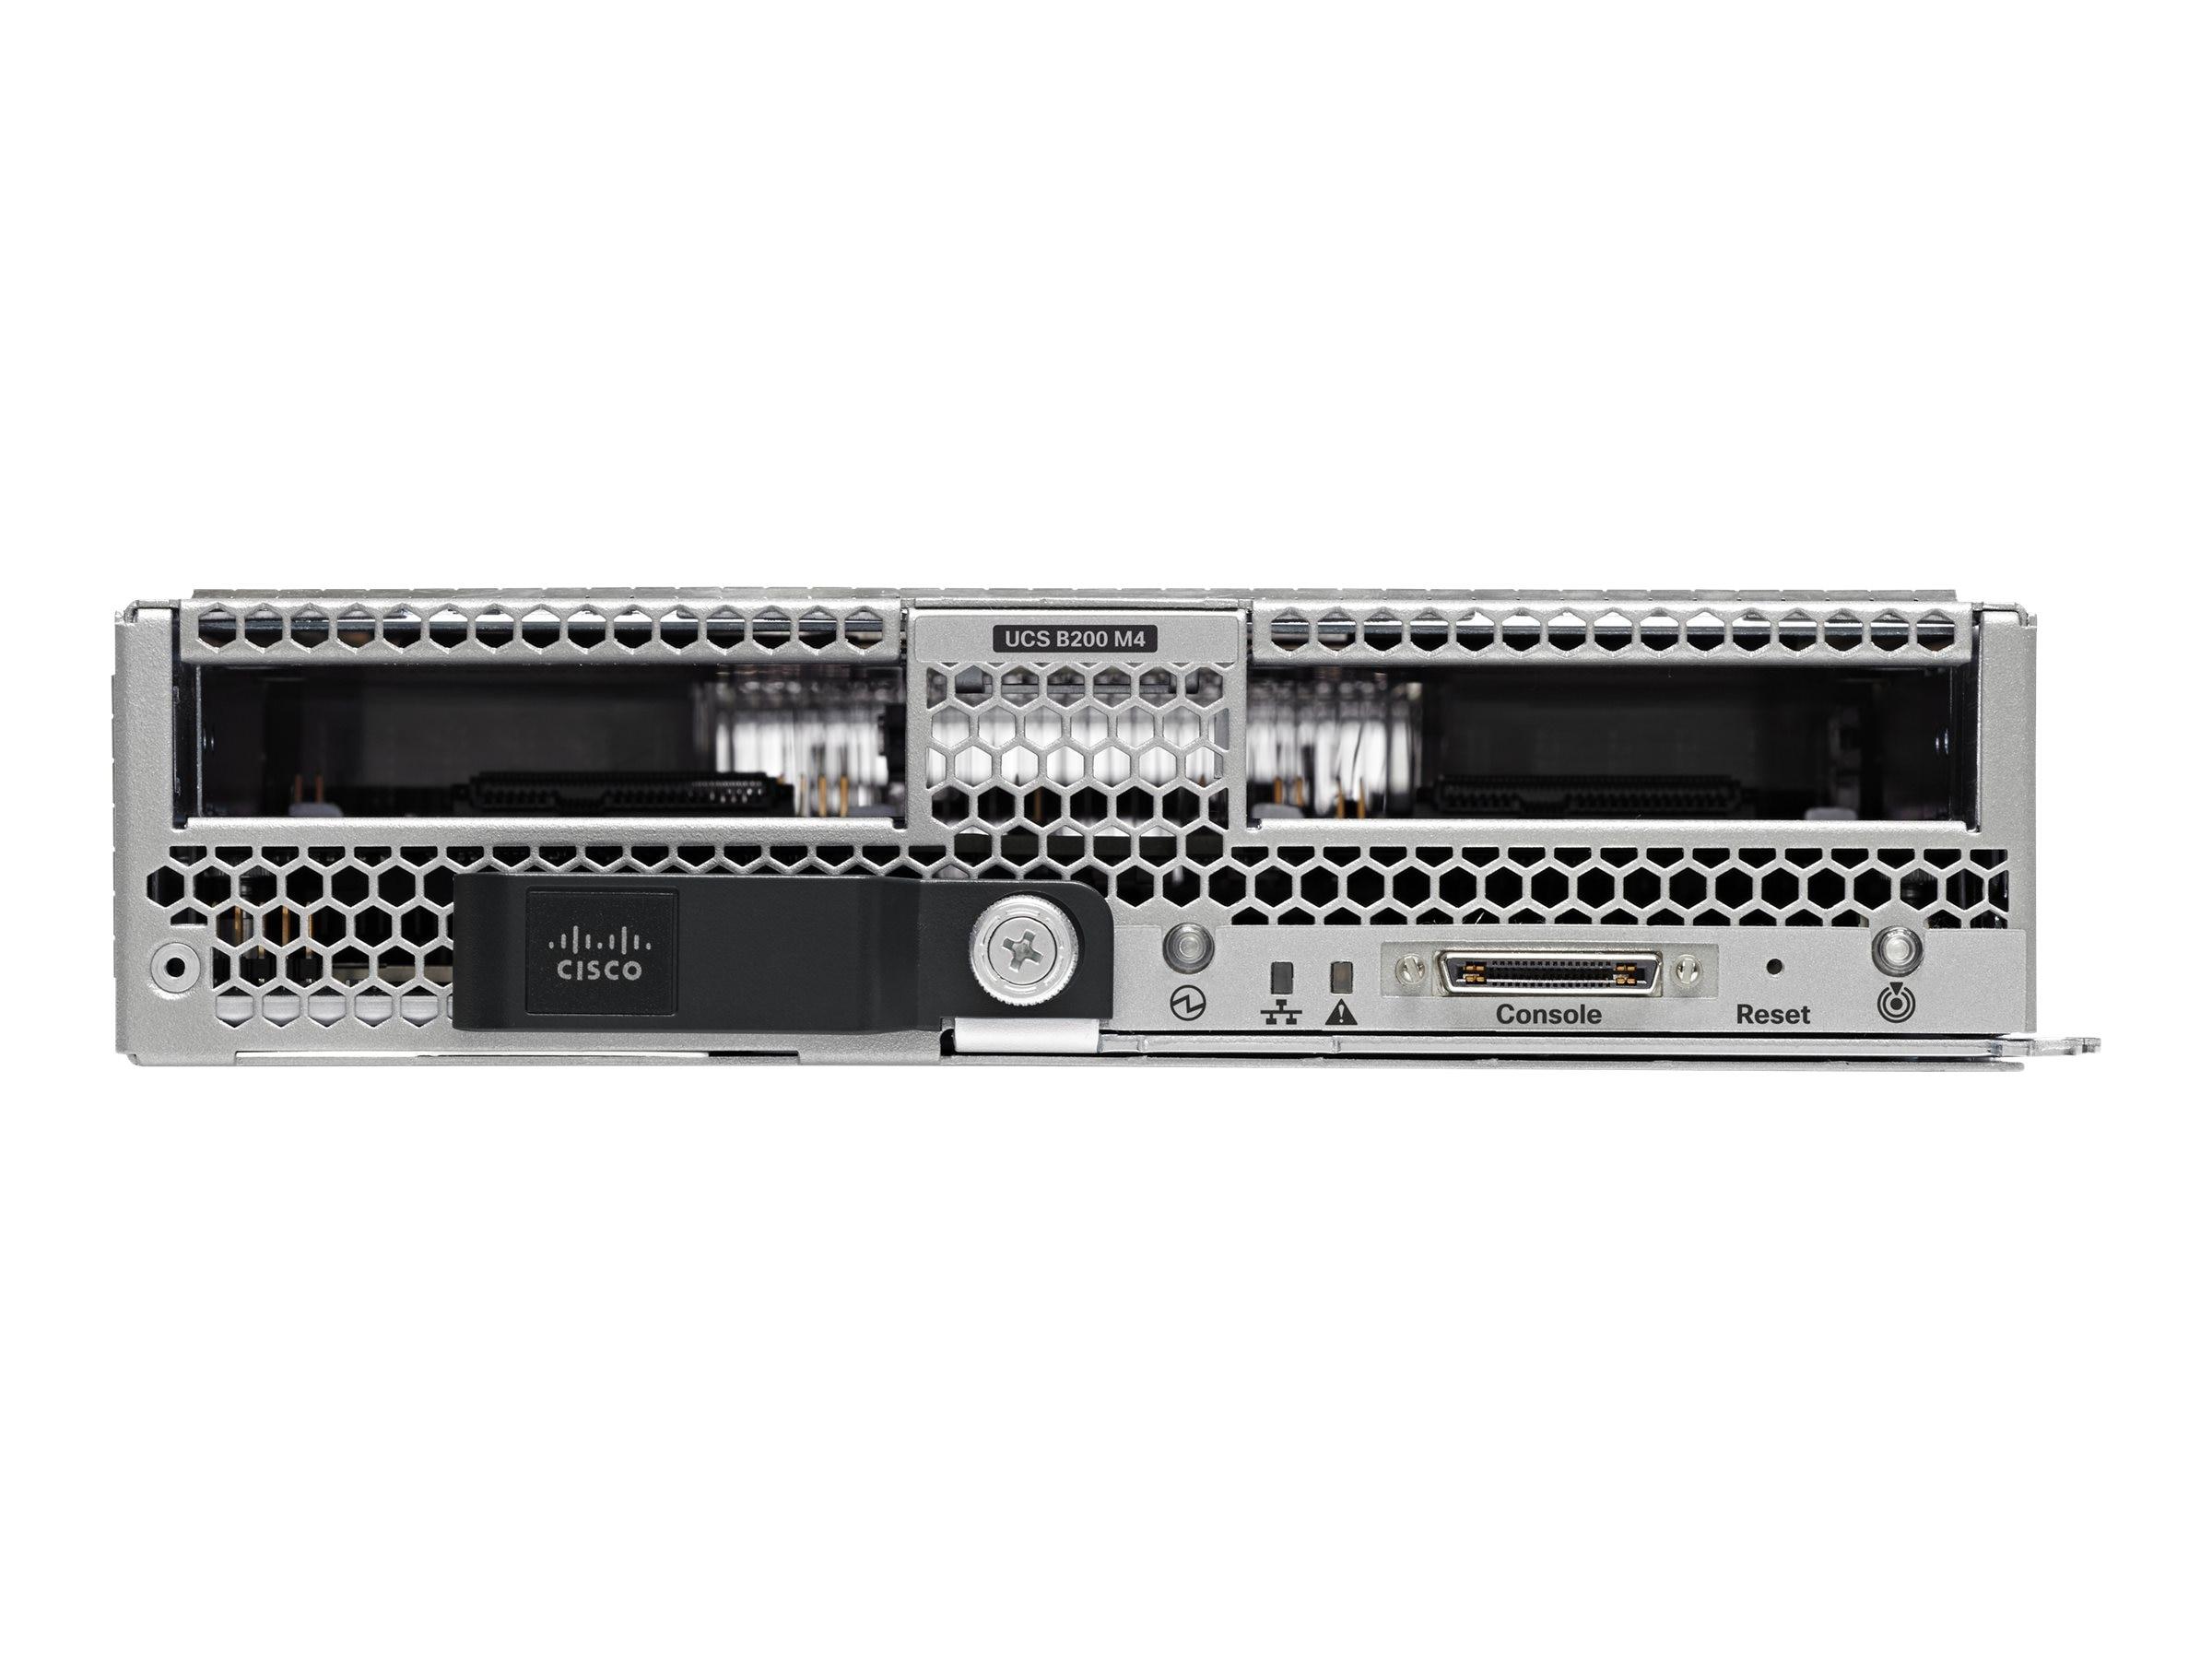 Cisco UCS-EZ8-B200M4-S Image 2